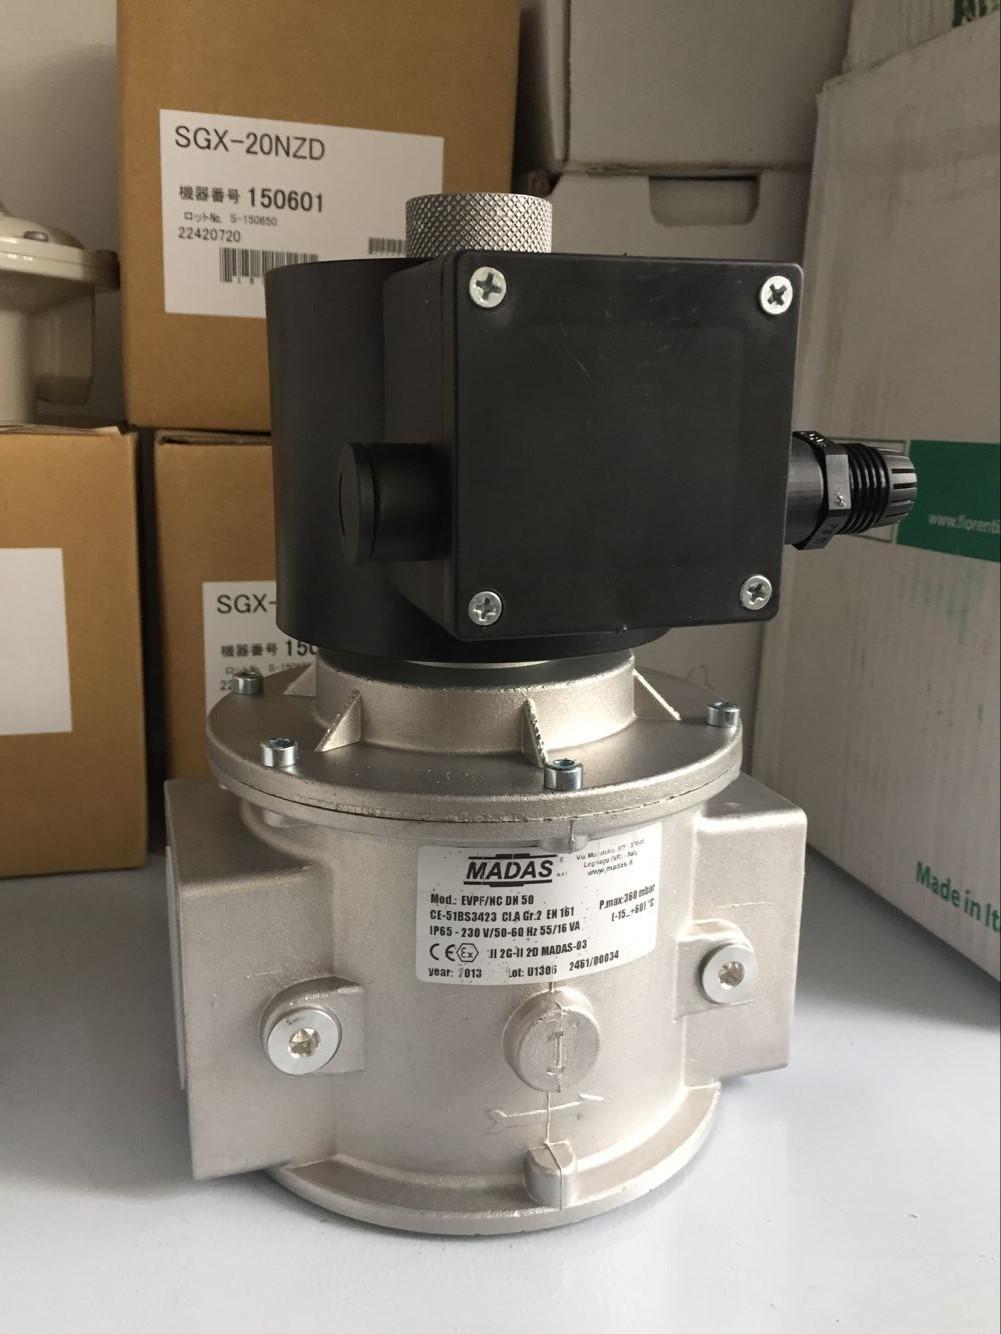 EVP(F)09 DN80(法兰)意大利MADAS燃气电磁阀